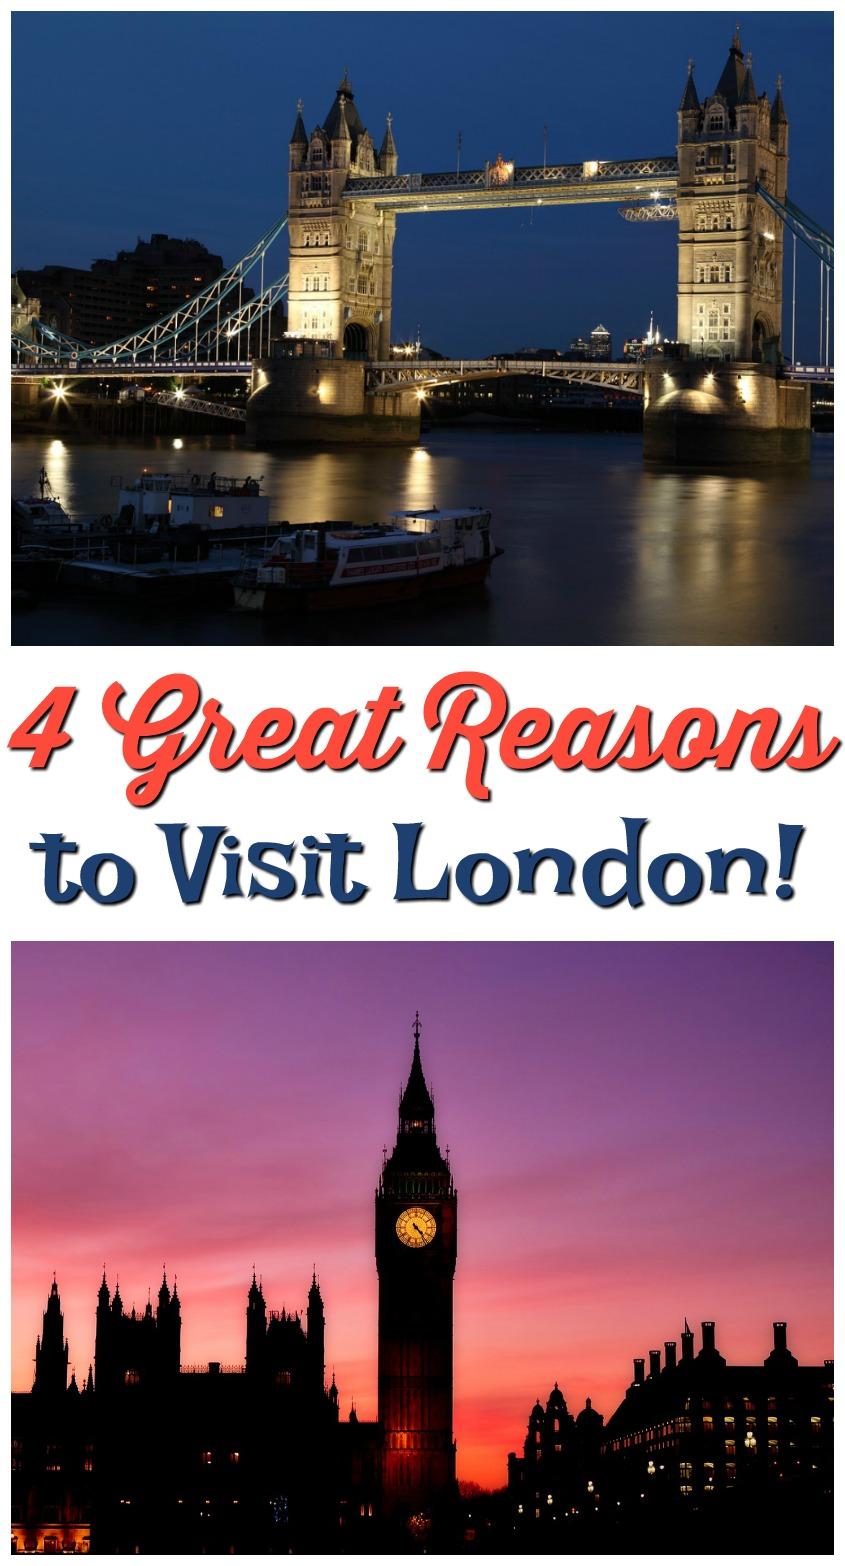 4 Great Reasons to Visit London #travel #vacation #destinations #traveltips #london